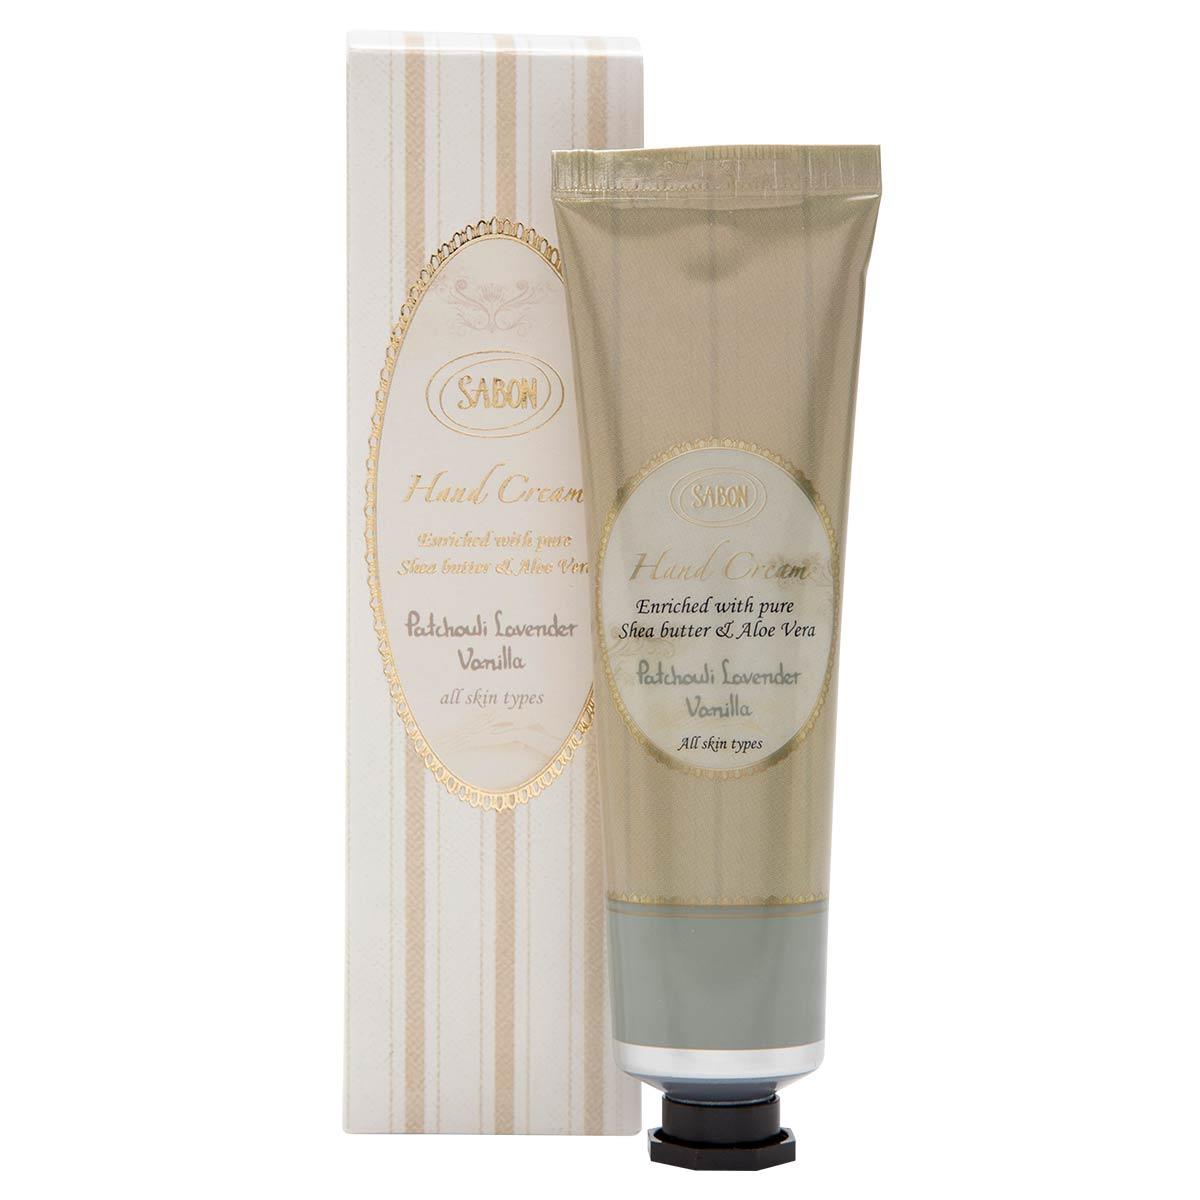 Hand Cream Tube - Patchouli Lavender Vanilla